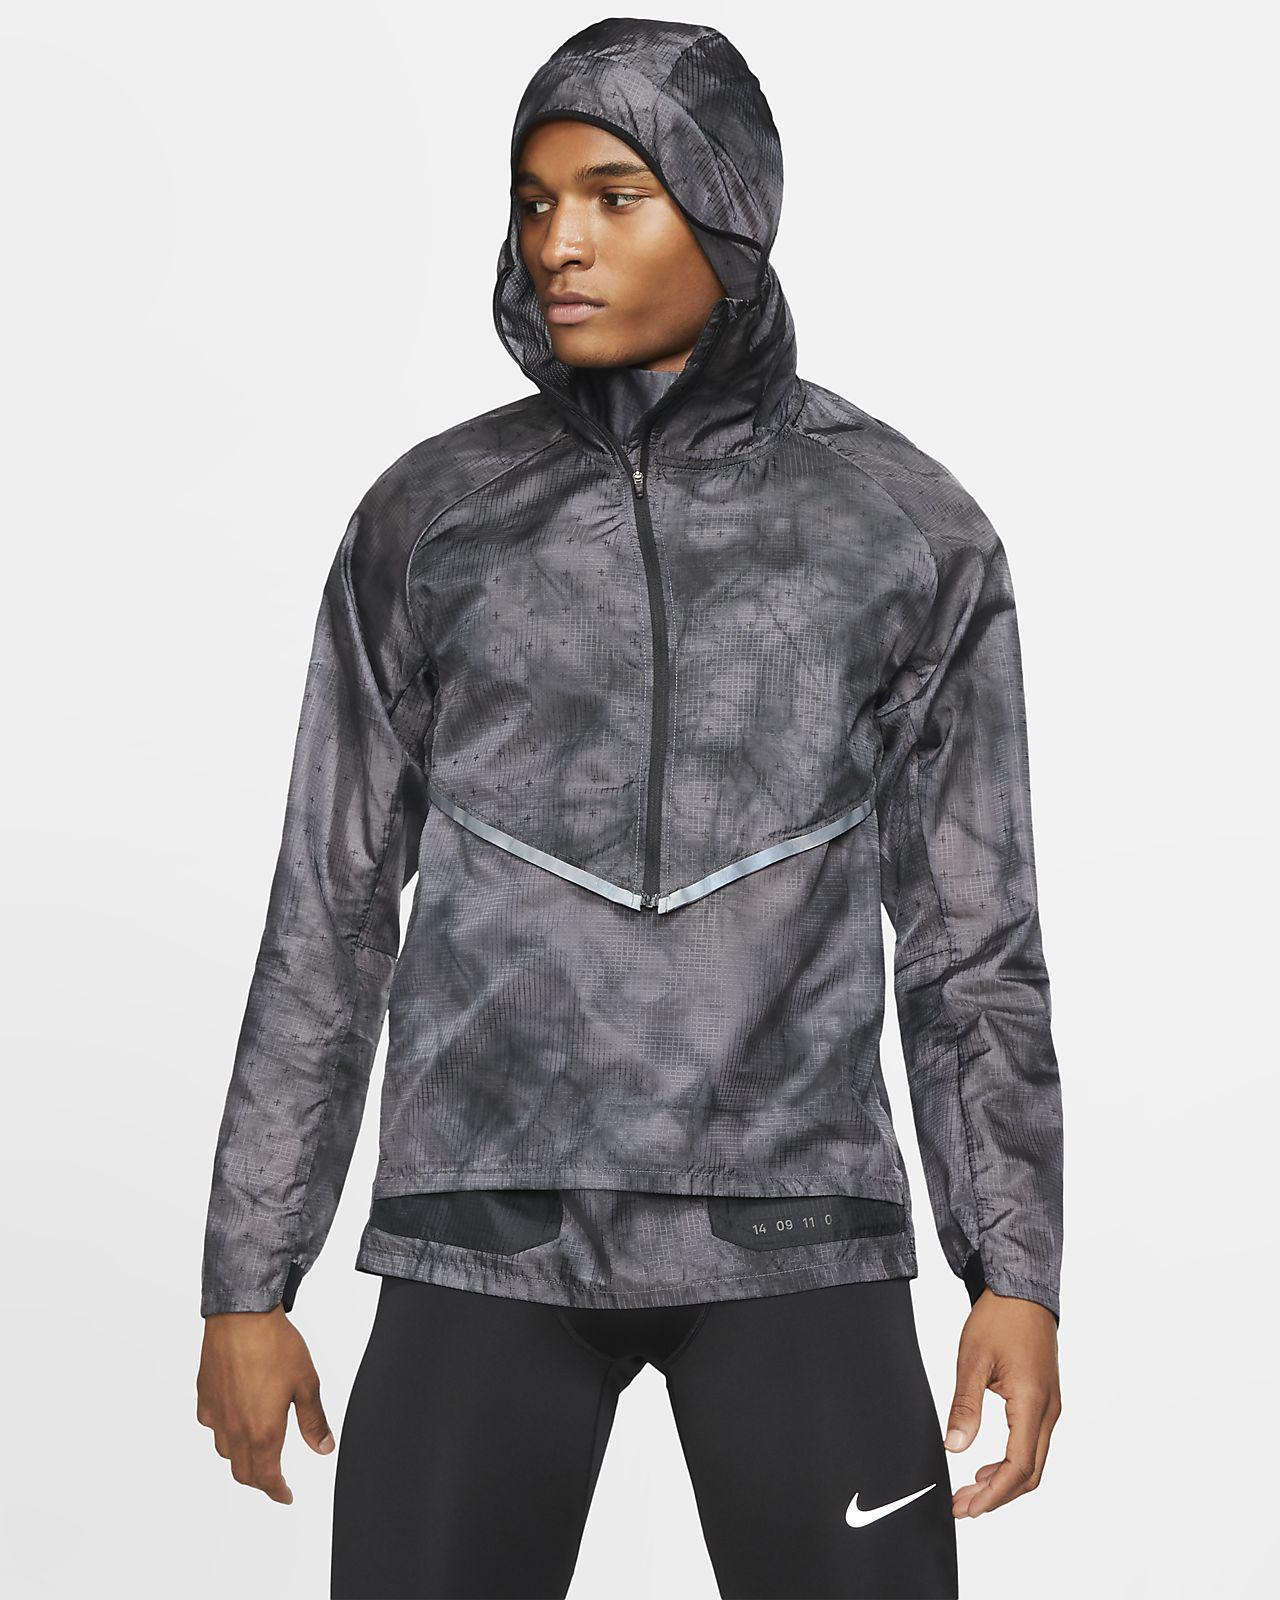 Nike Tech Pack Herren-Laufjacke mit Kapuze